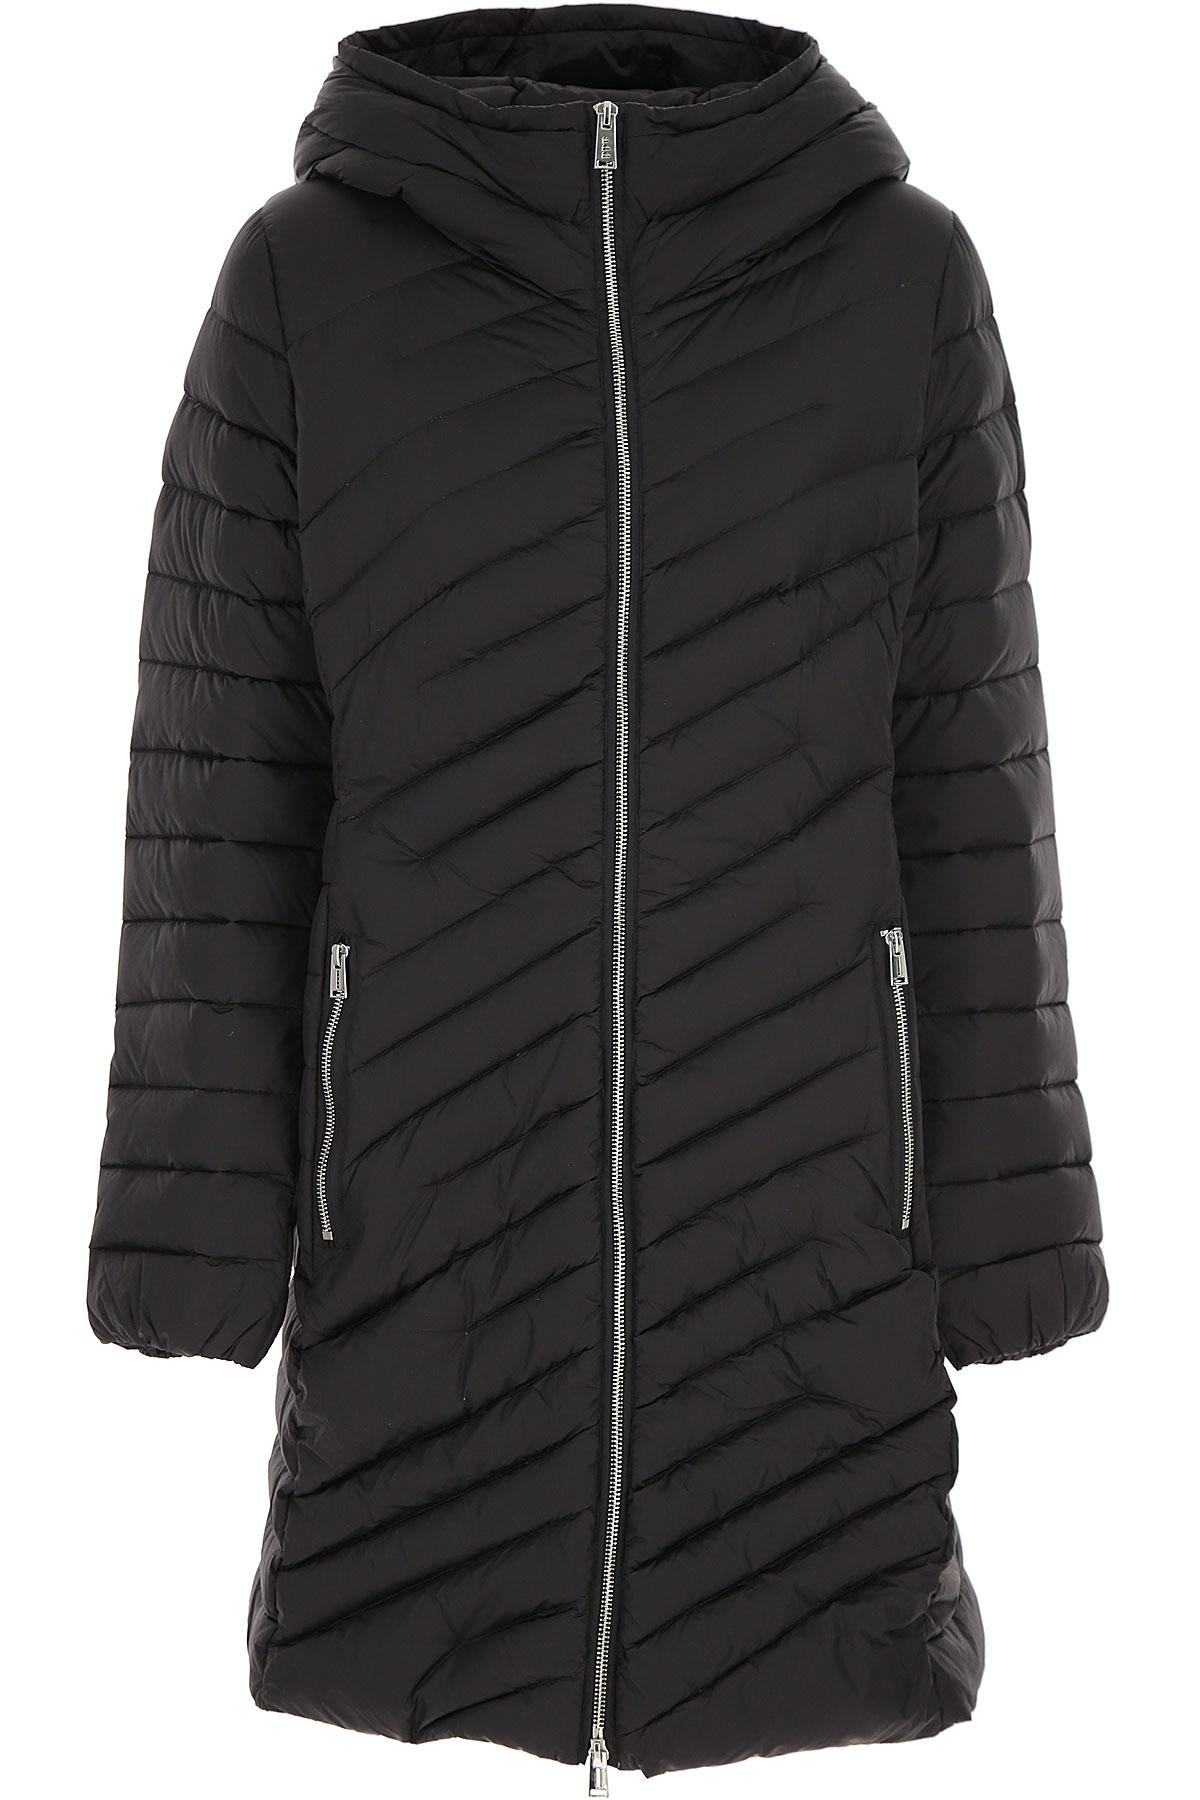 ADD Jacket for Women, Black, polyamide, 2019, 10 12 6 8